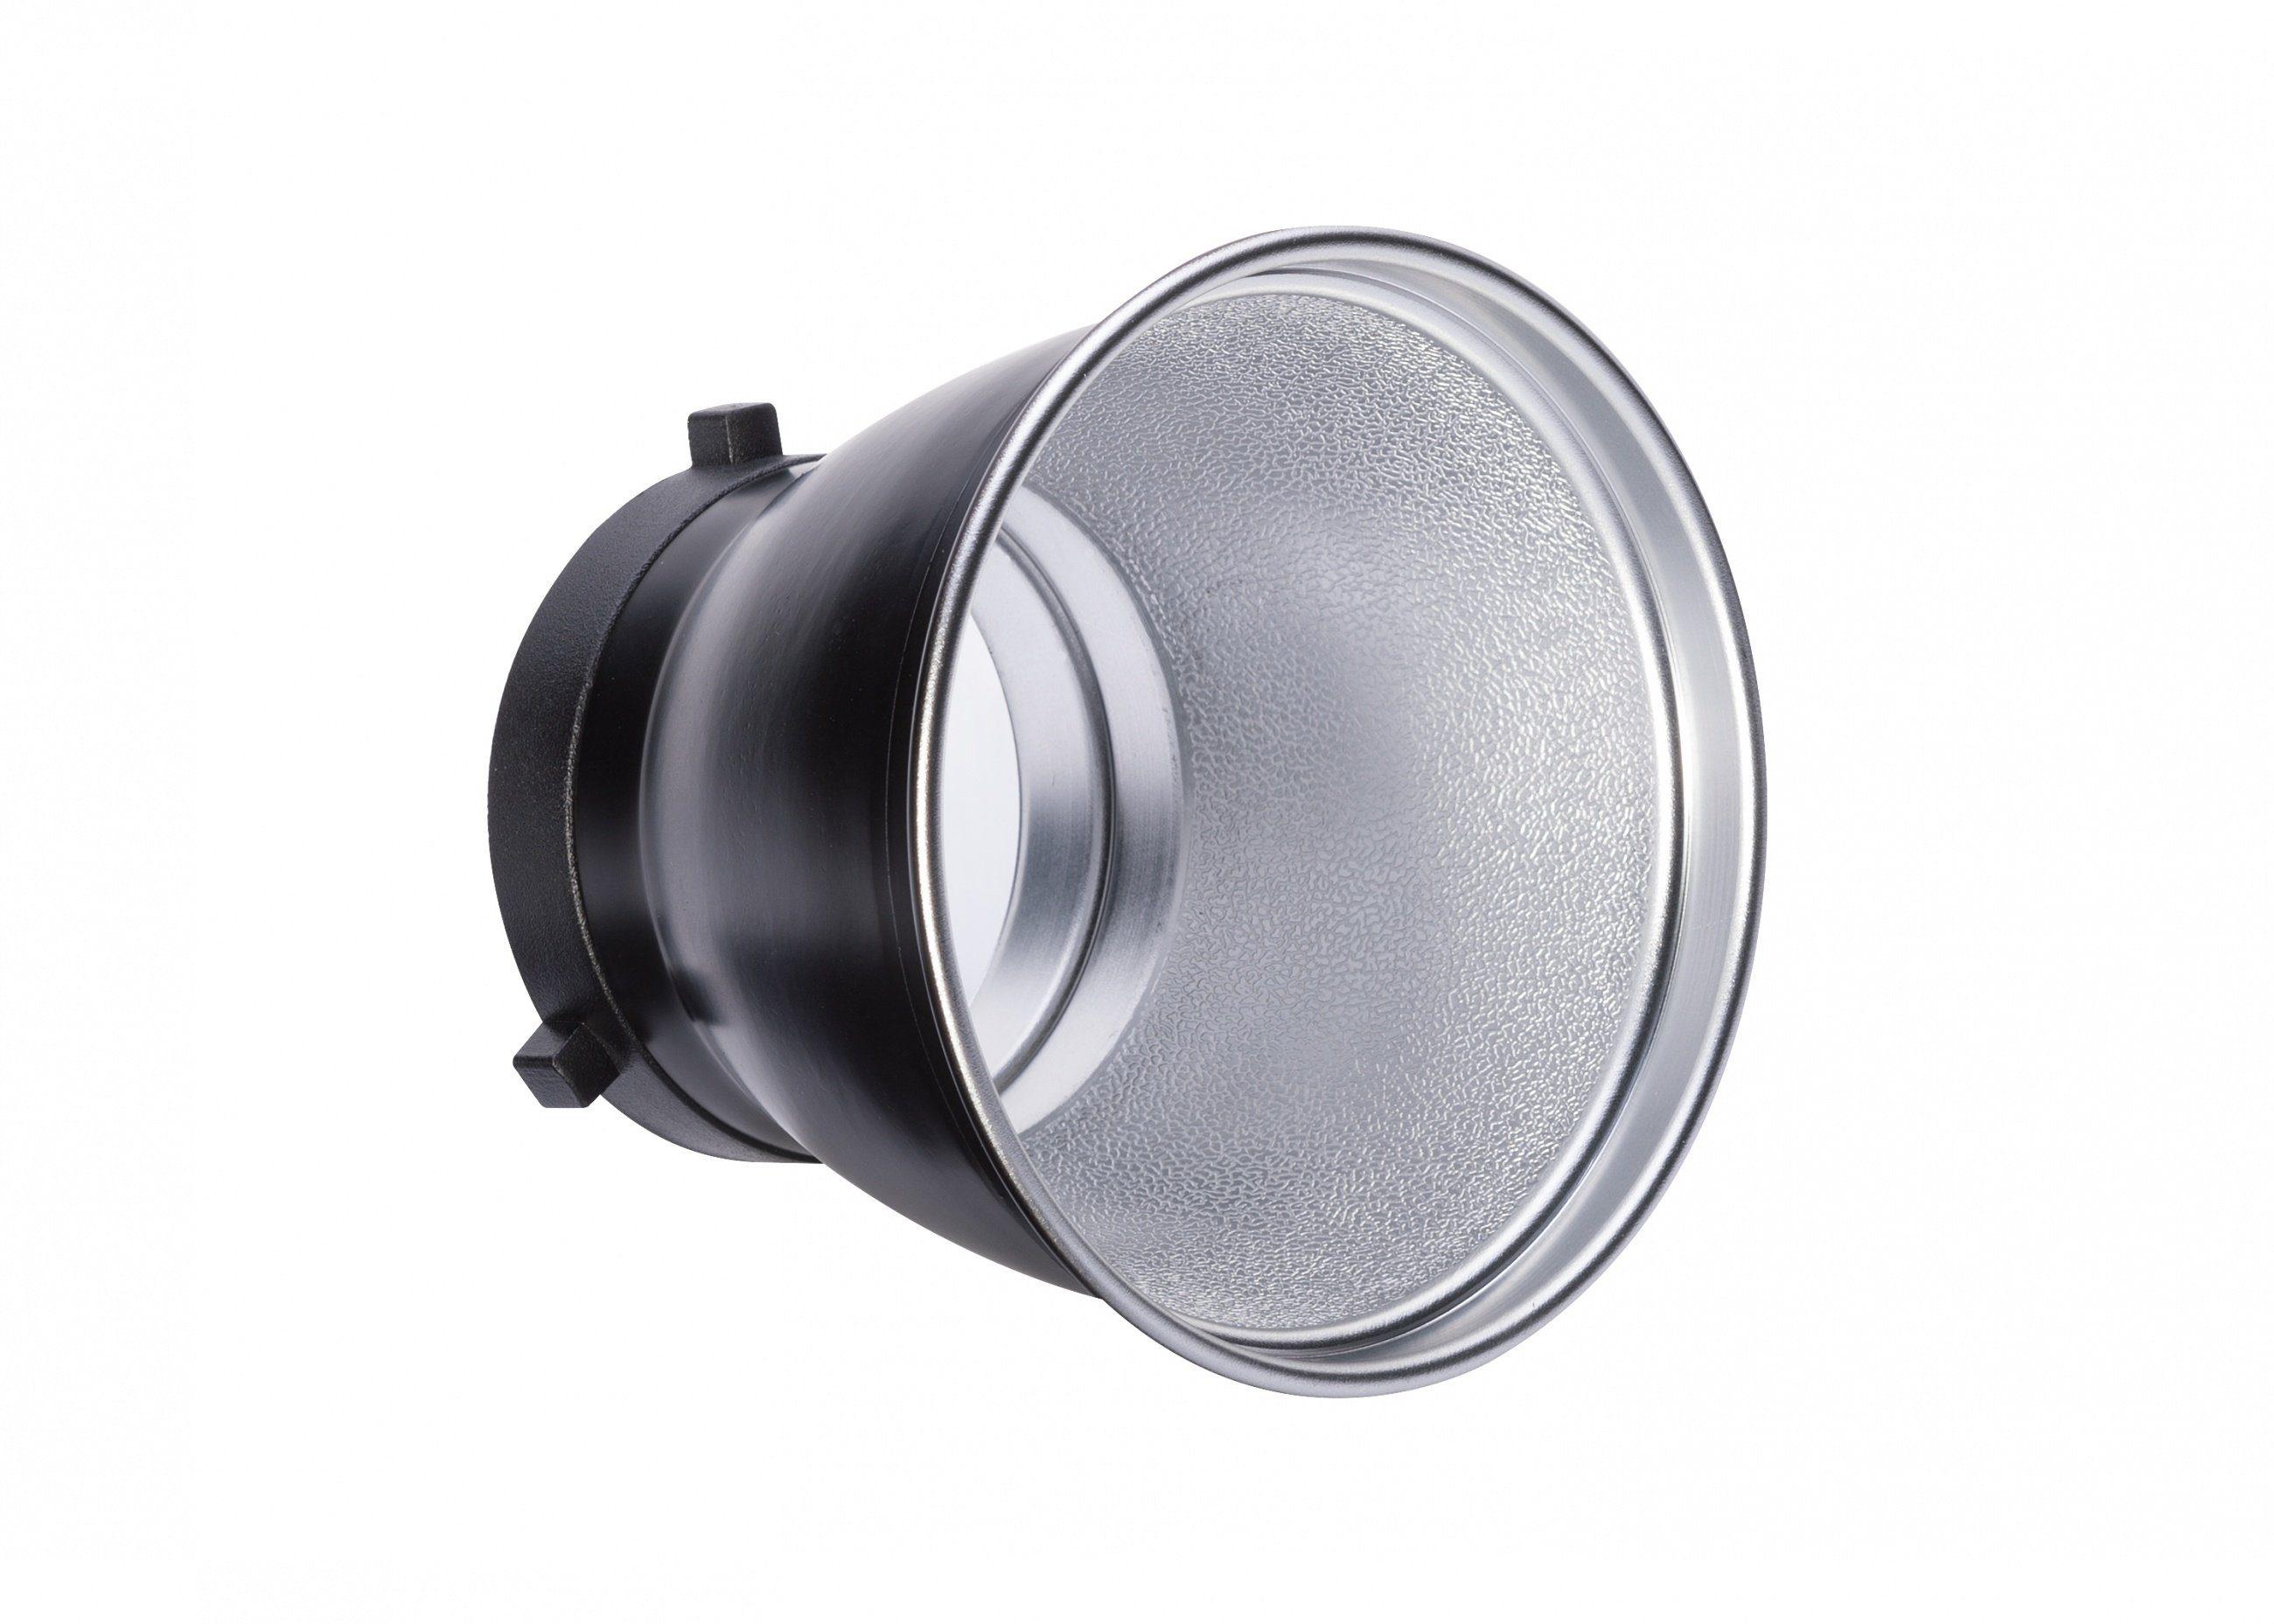 Bresser Fotostudio »M-11 breiter Reflektor 15 cm«